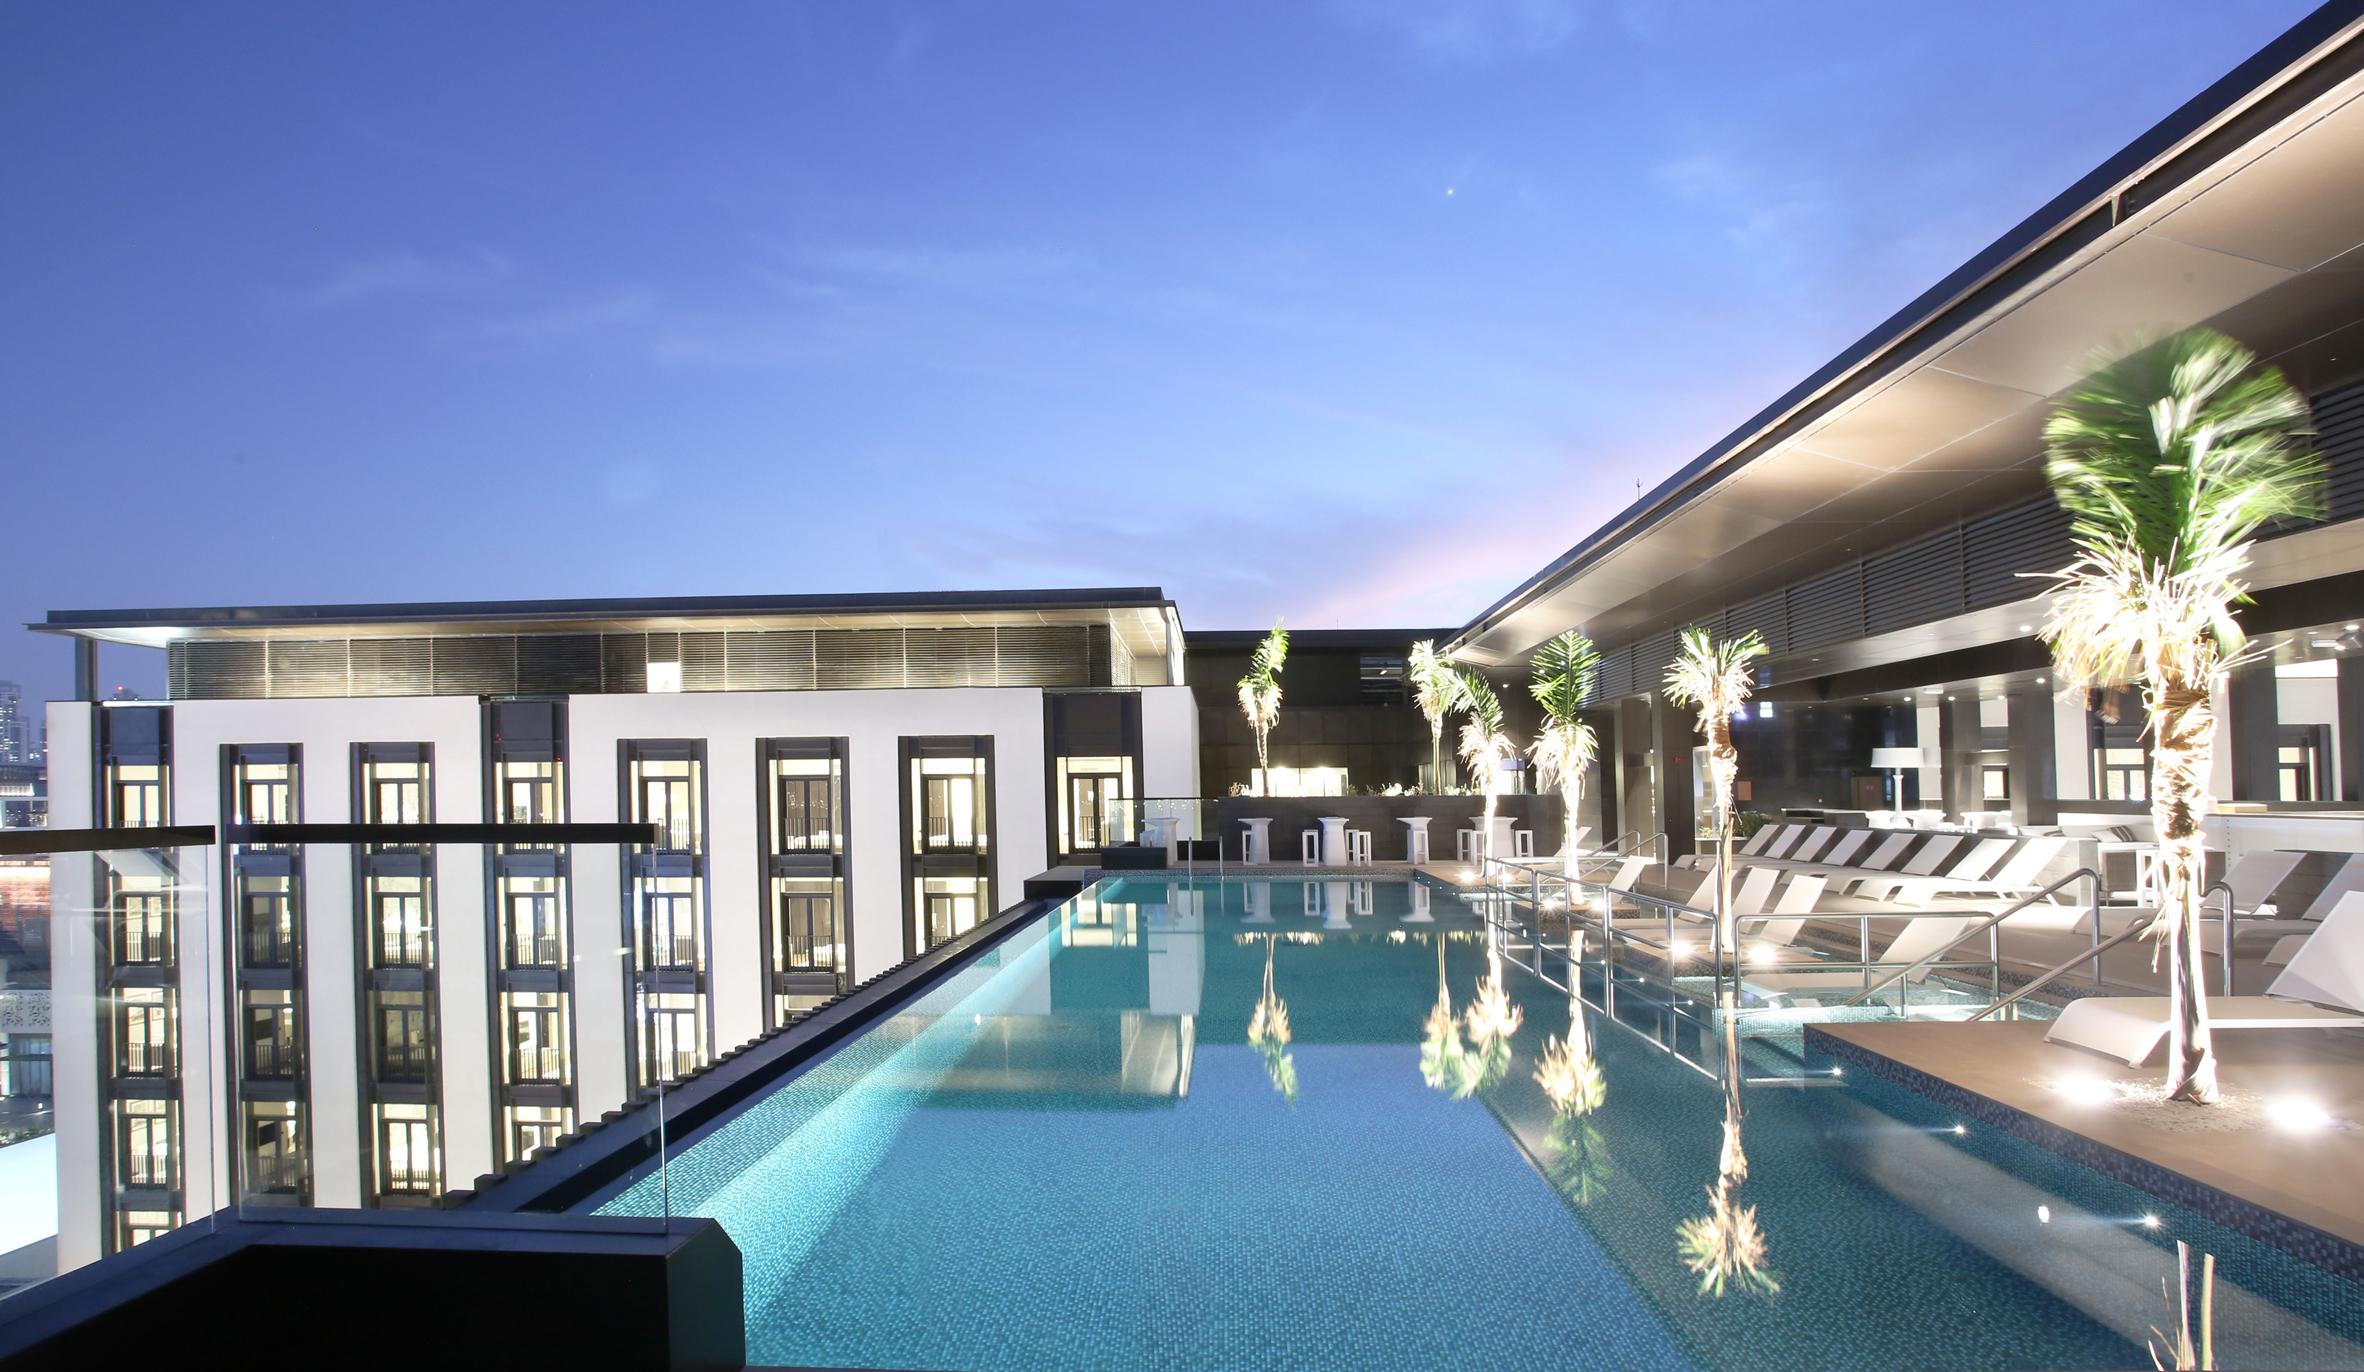 La Ville Hotel & Suites City Walk in Dubai